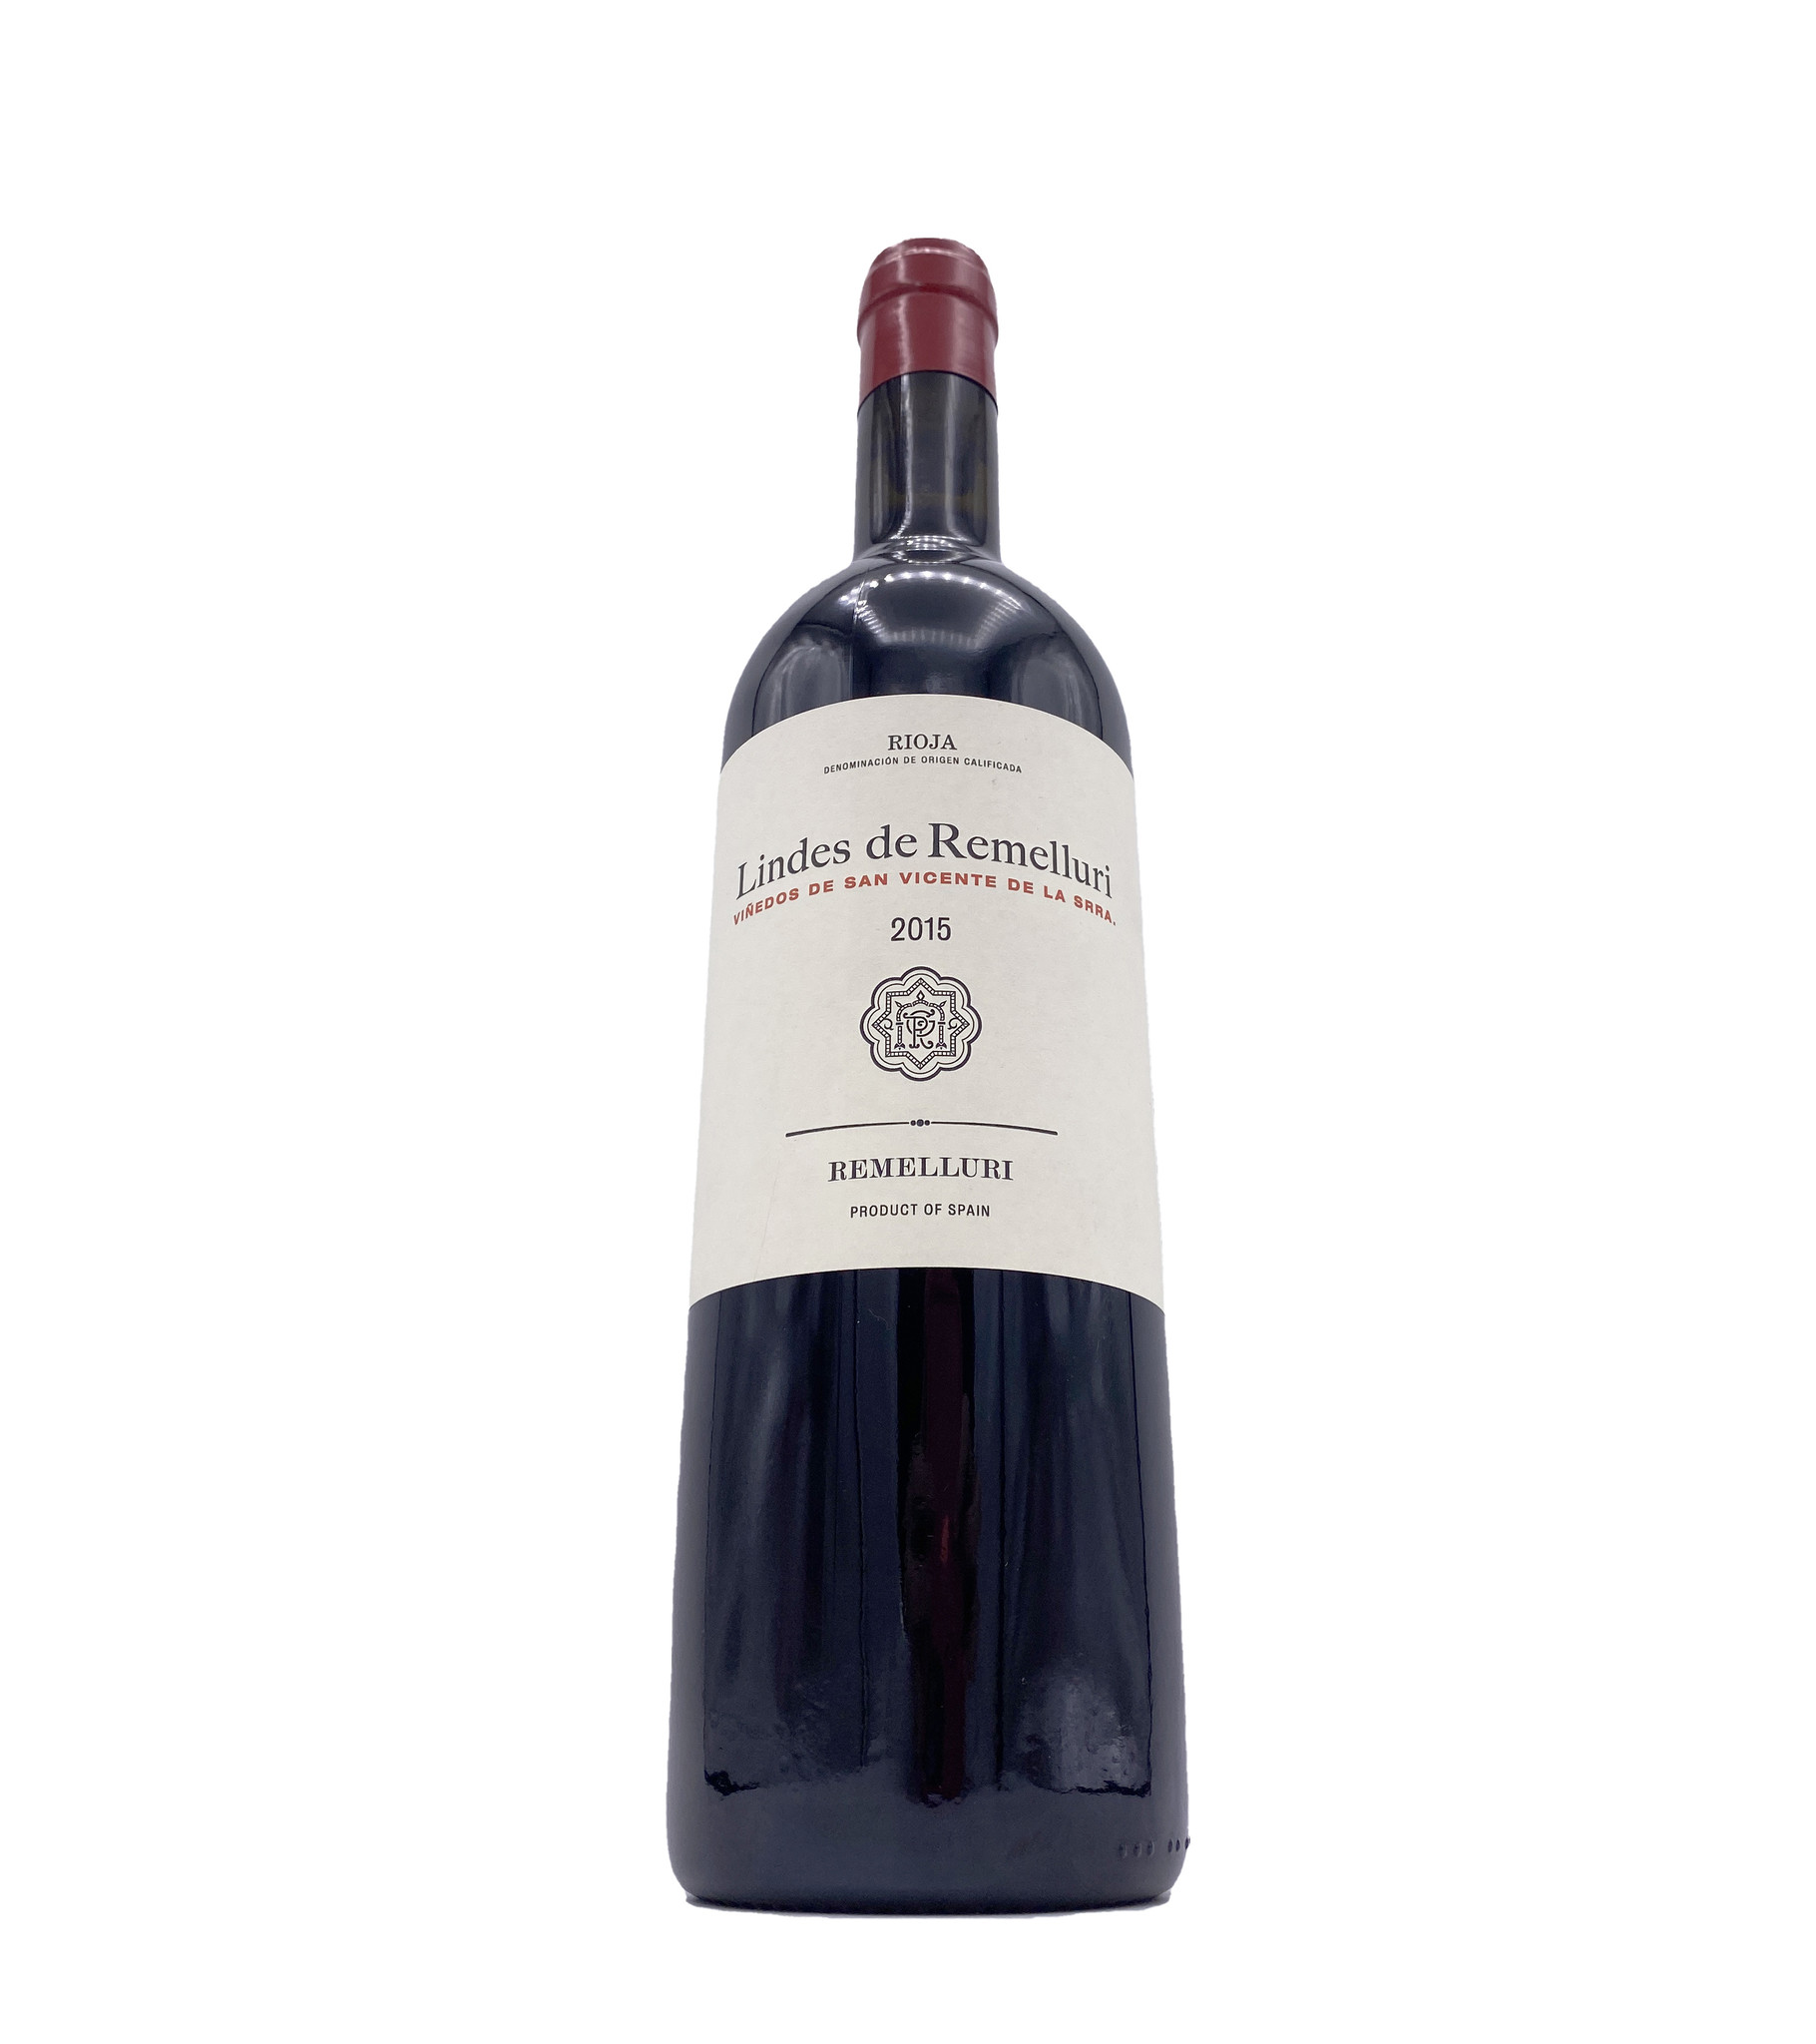 Rioja Lindes de Remelluri 2015 Remelluri